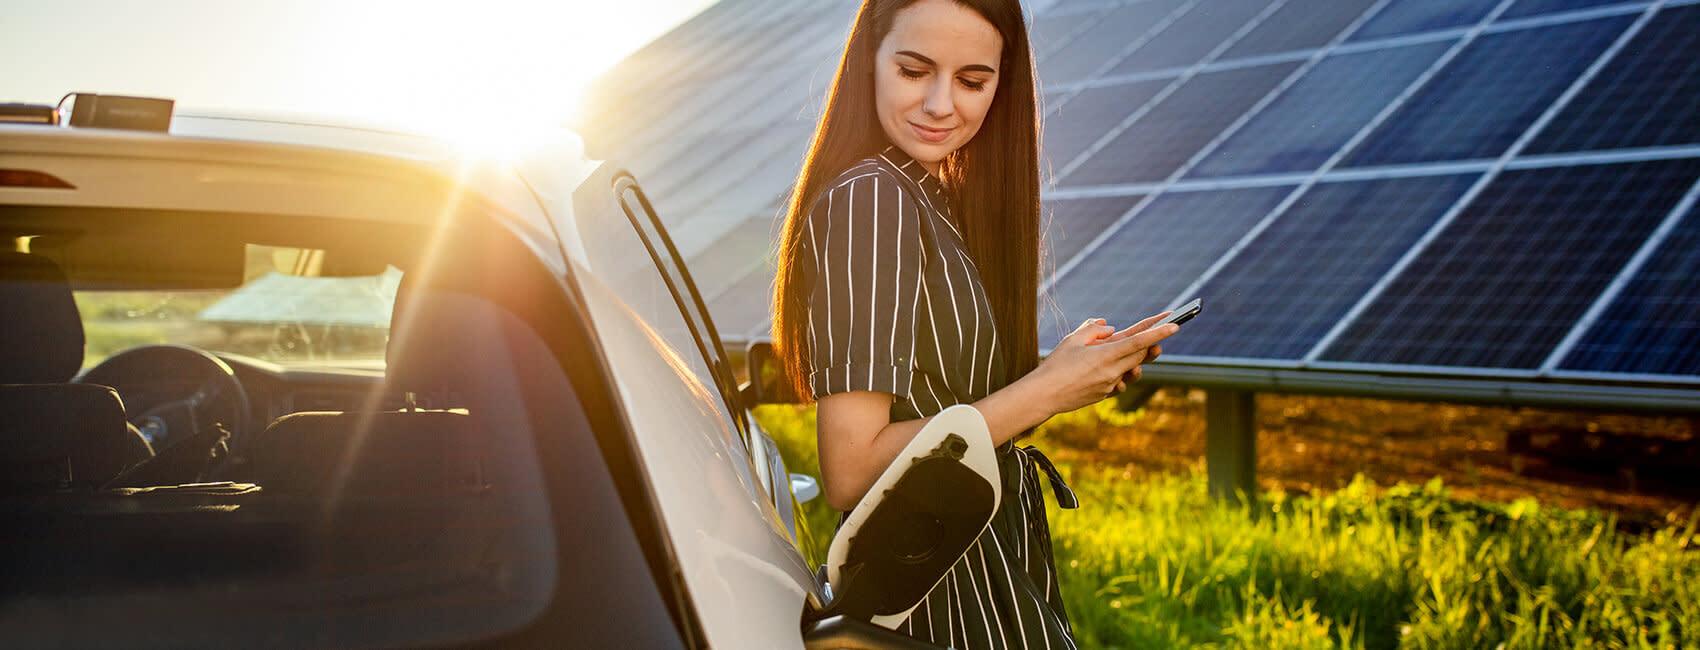 woman-charging-EV-iStock-1284781525-cropped.jpg